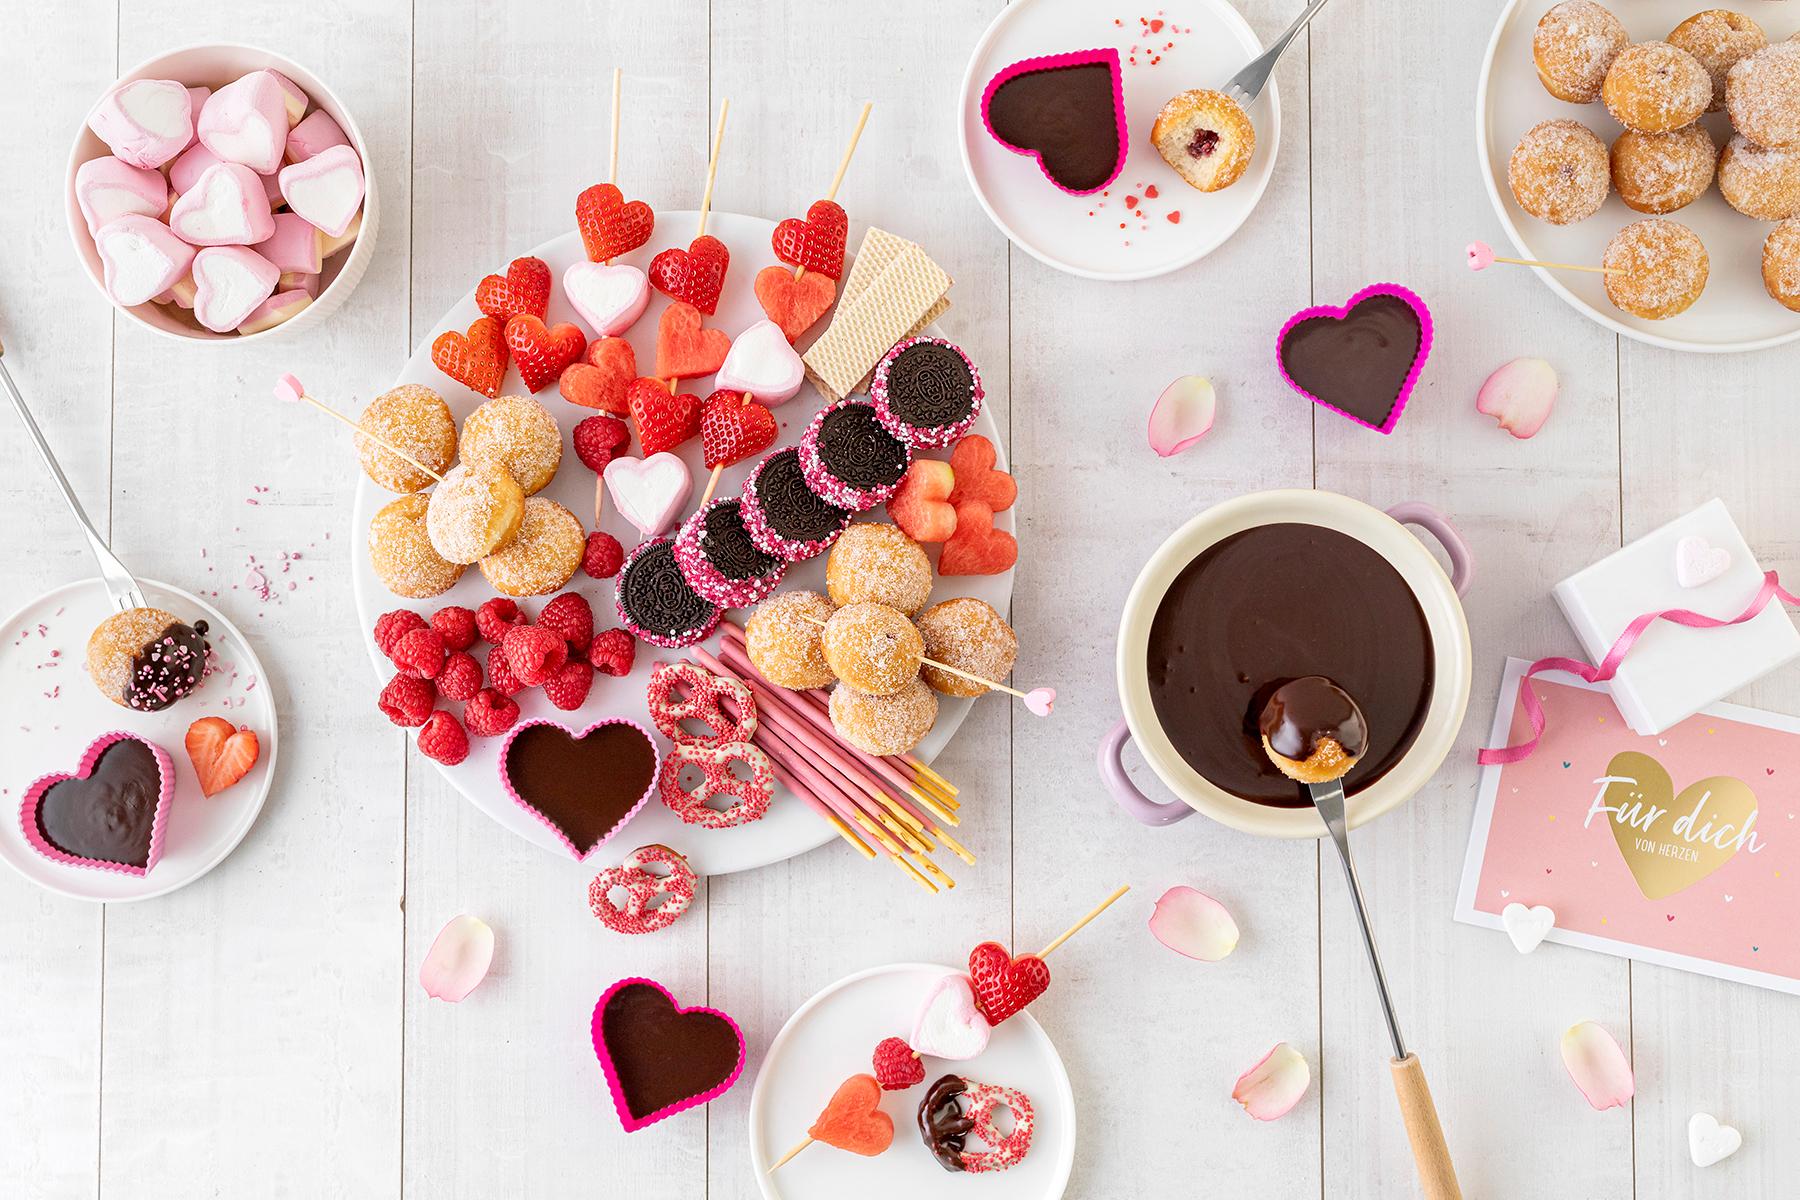 Süßes Schokofondue zum Valentinstag